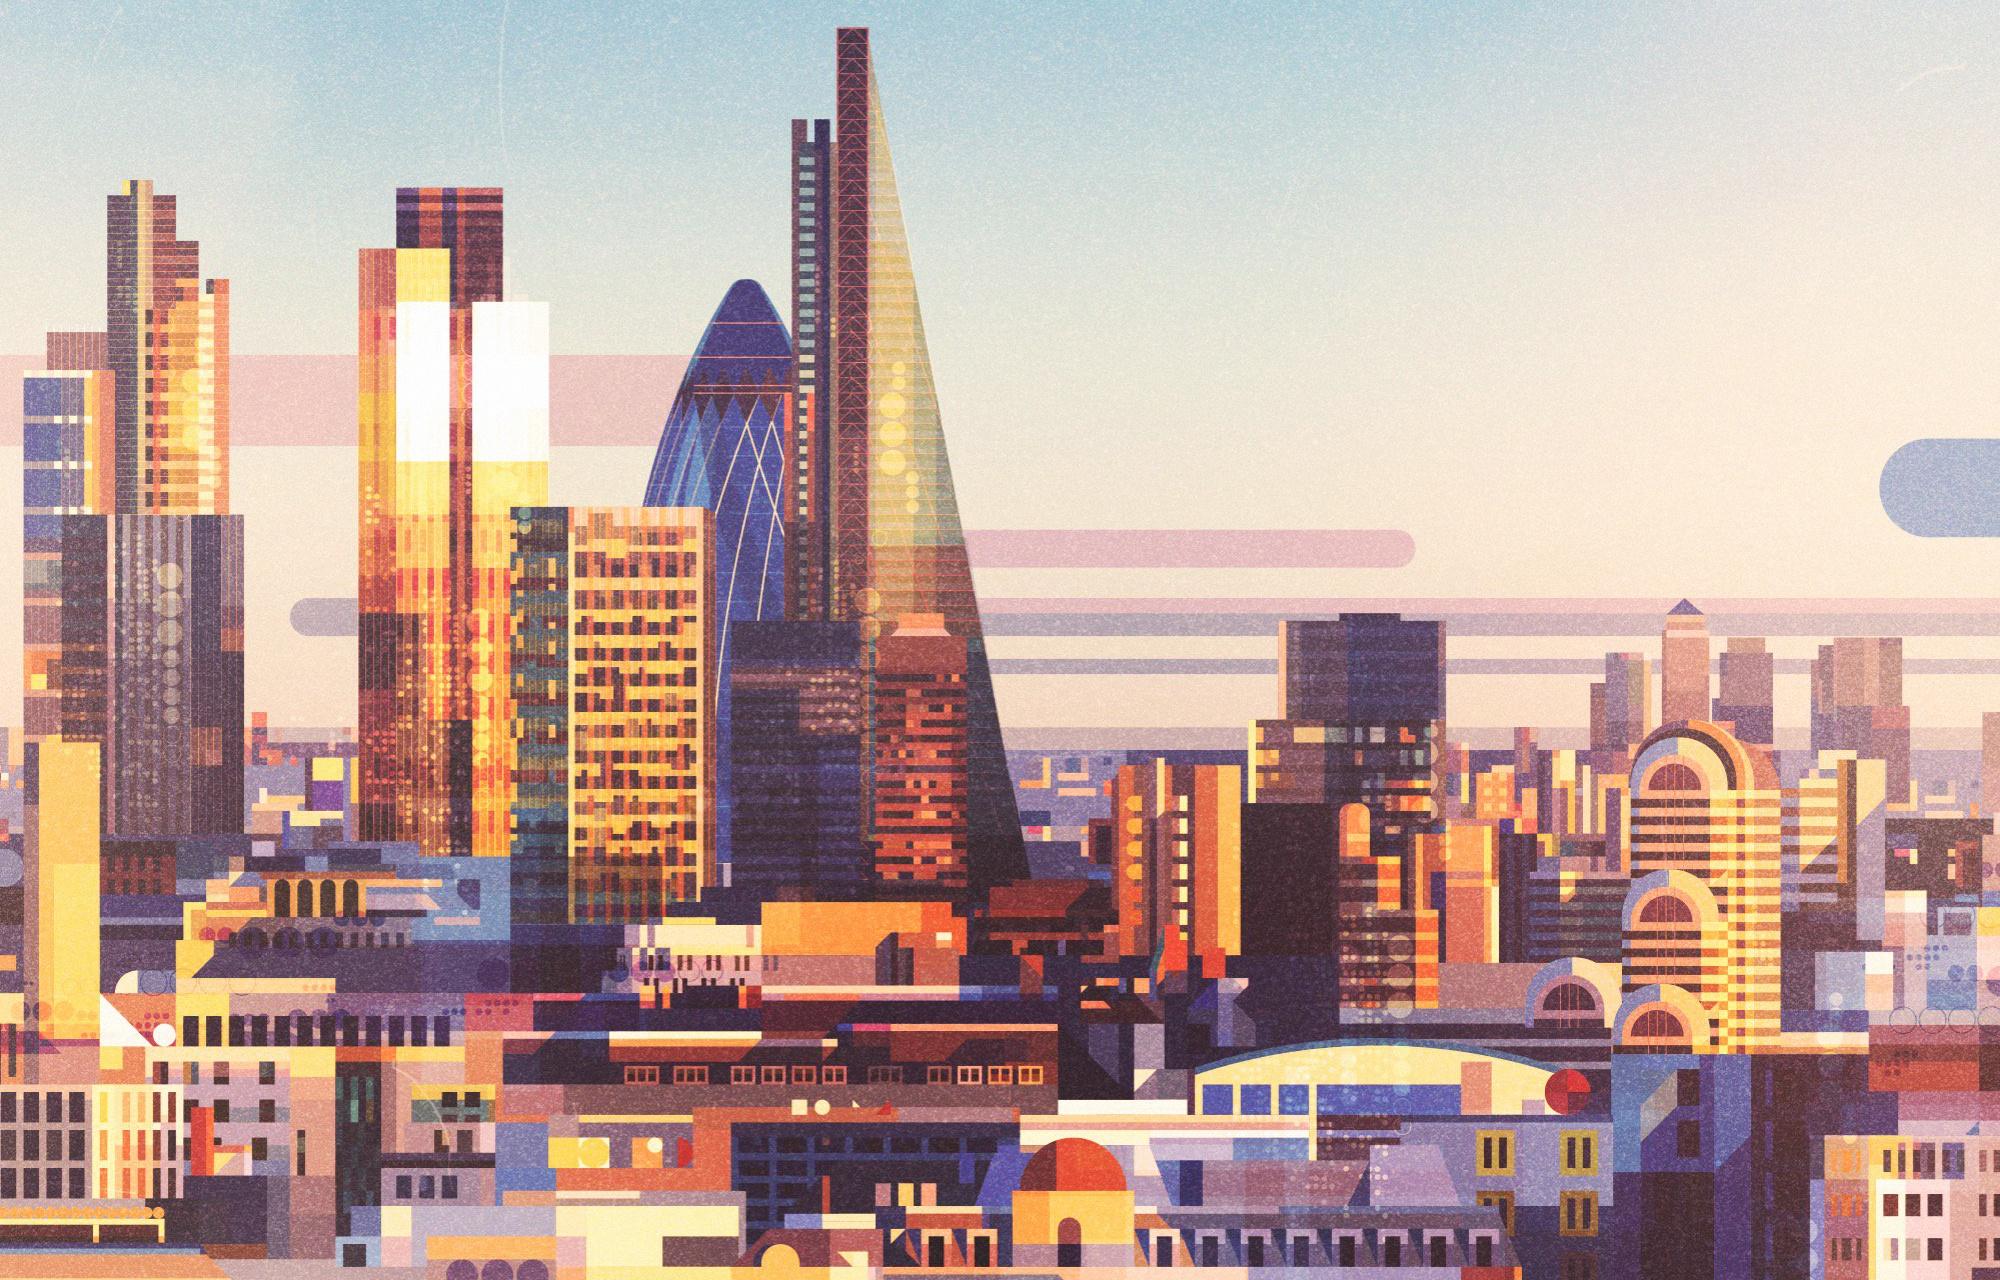 England City Building Architecture Artistic 2000x1280